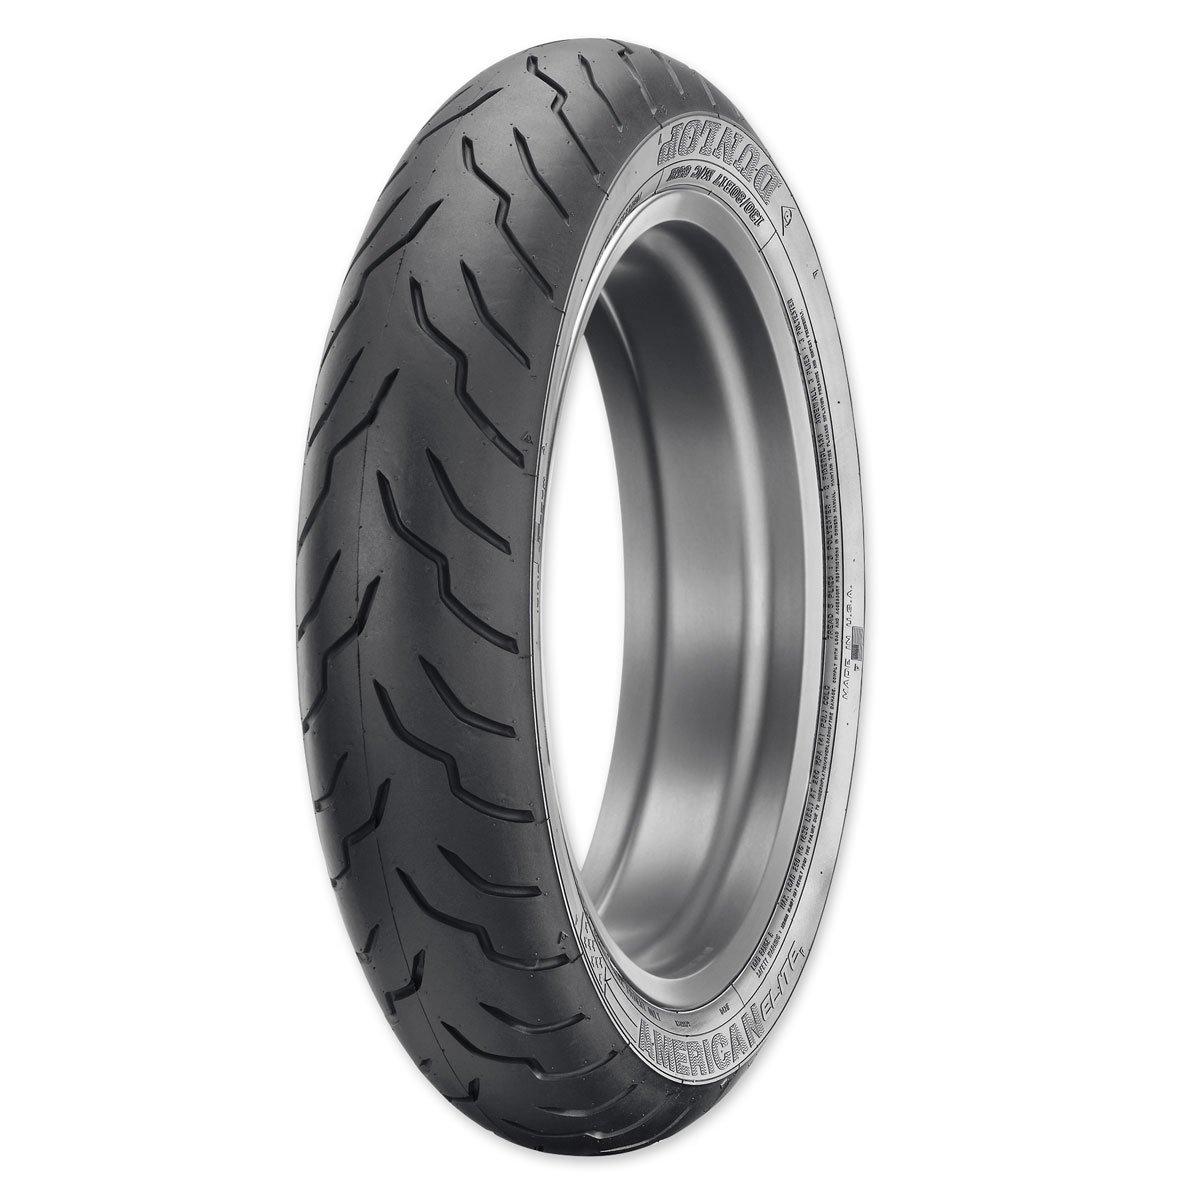 Dunlop American Elite Front Motorcycle Tires - 130/60B-19 31AE-15